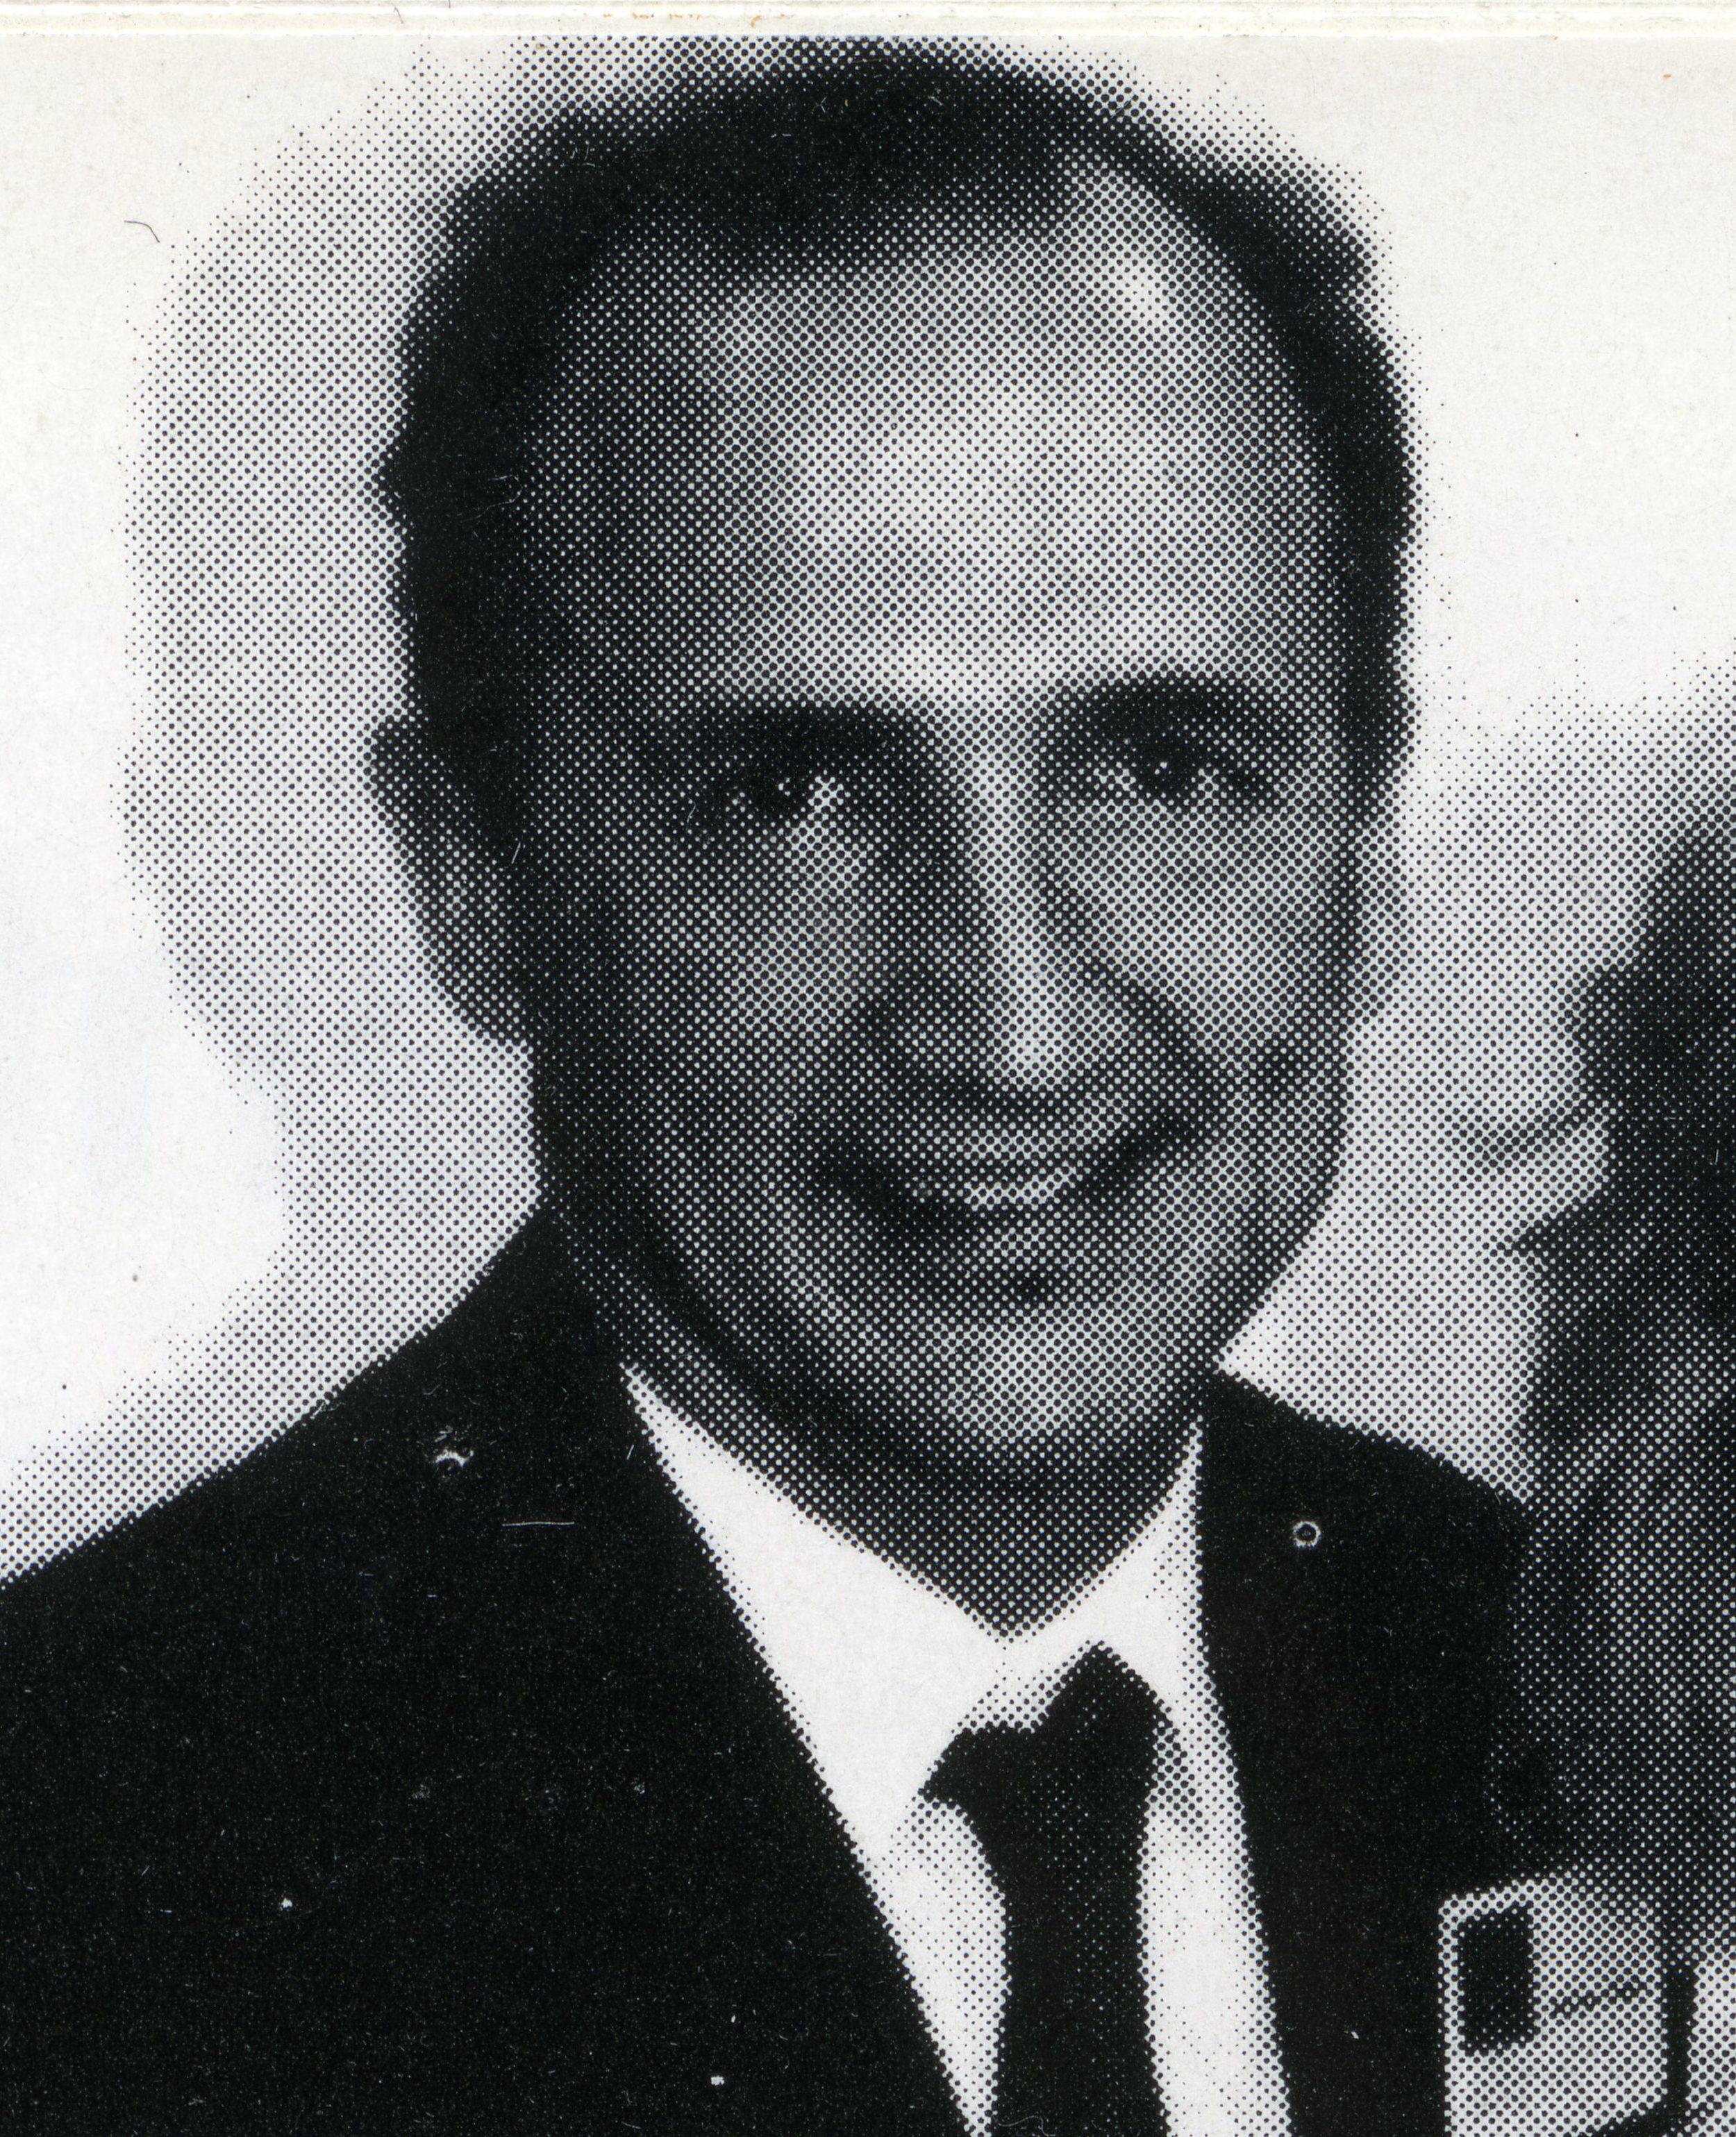 Michael Clancy